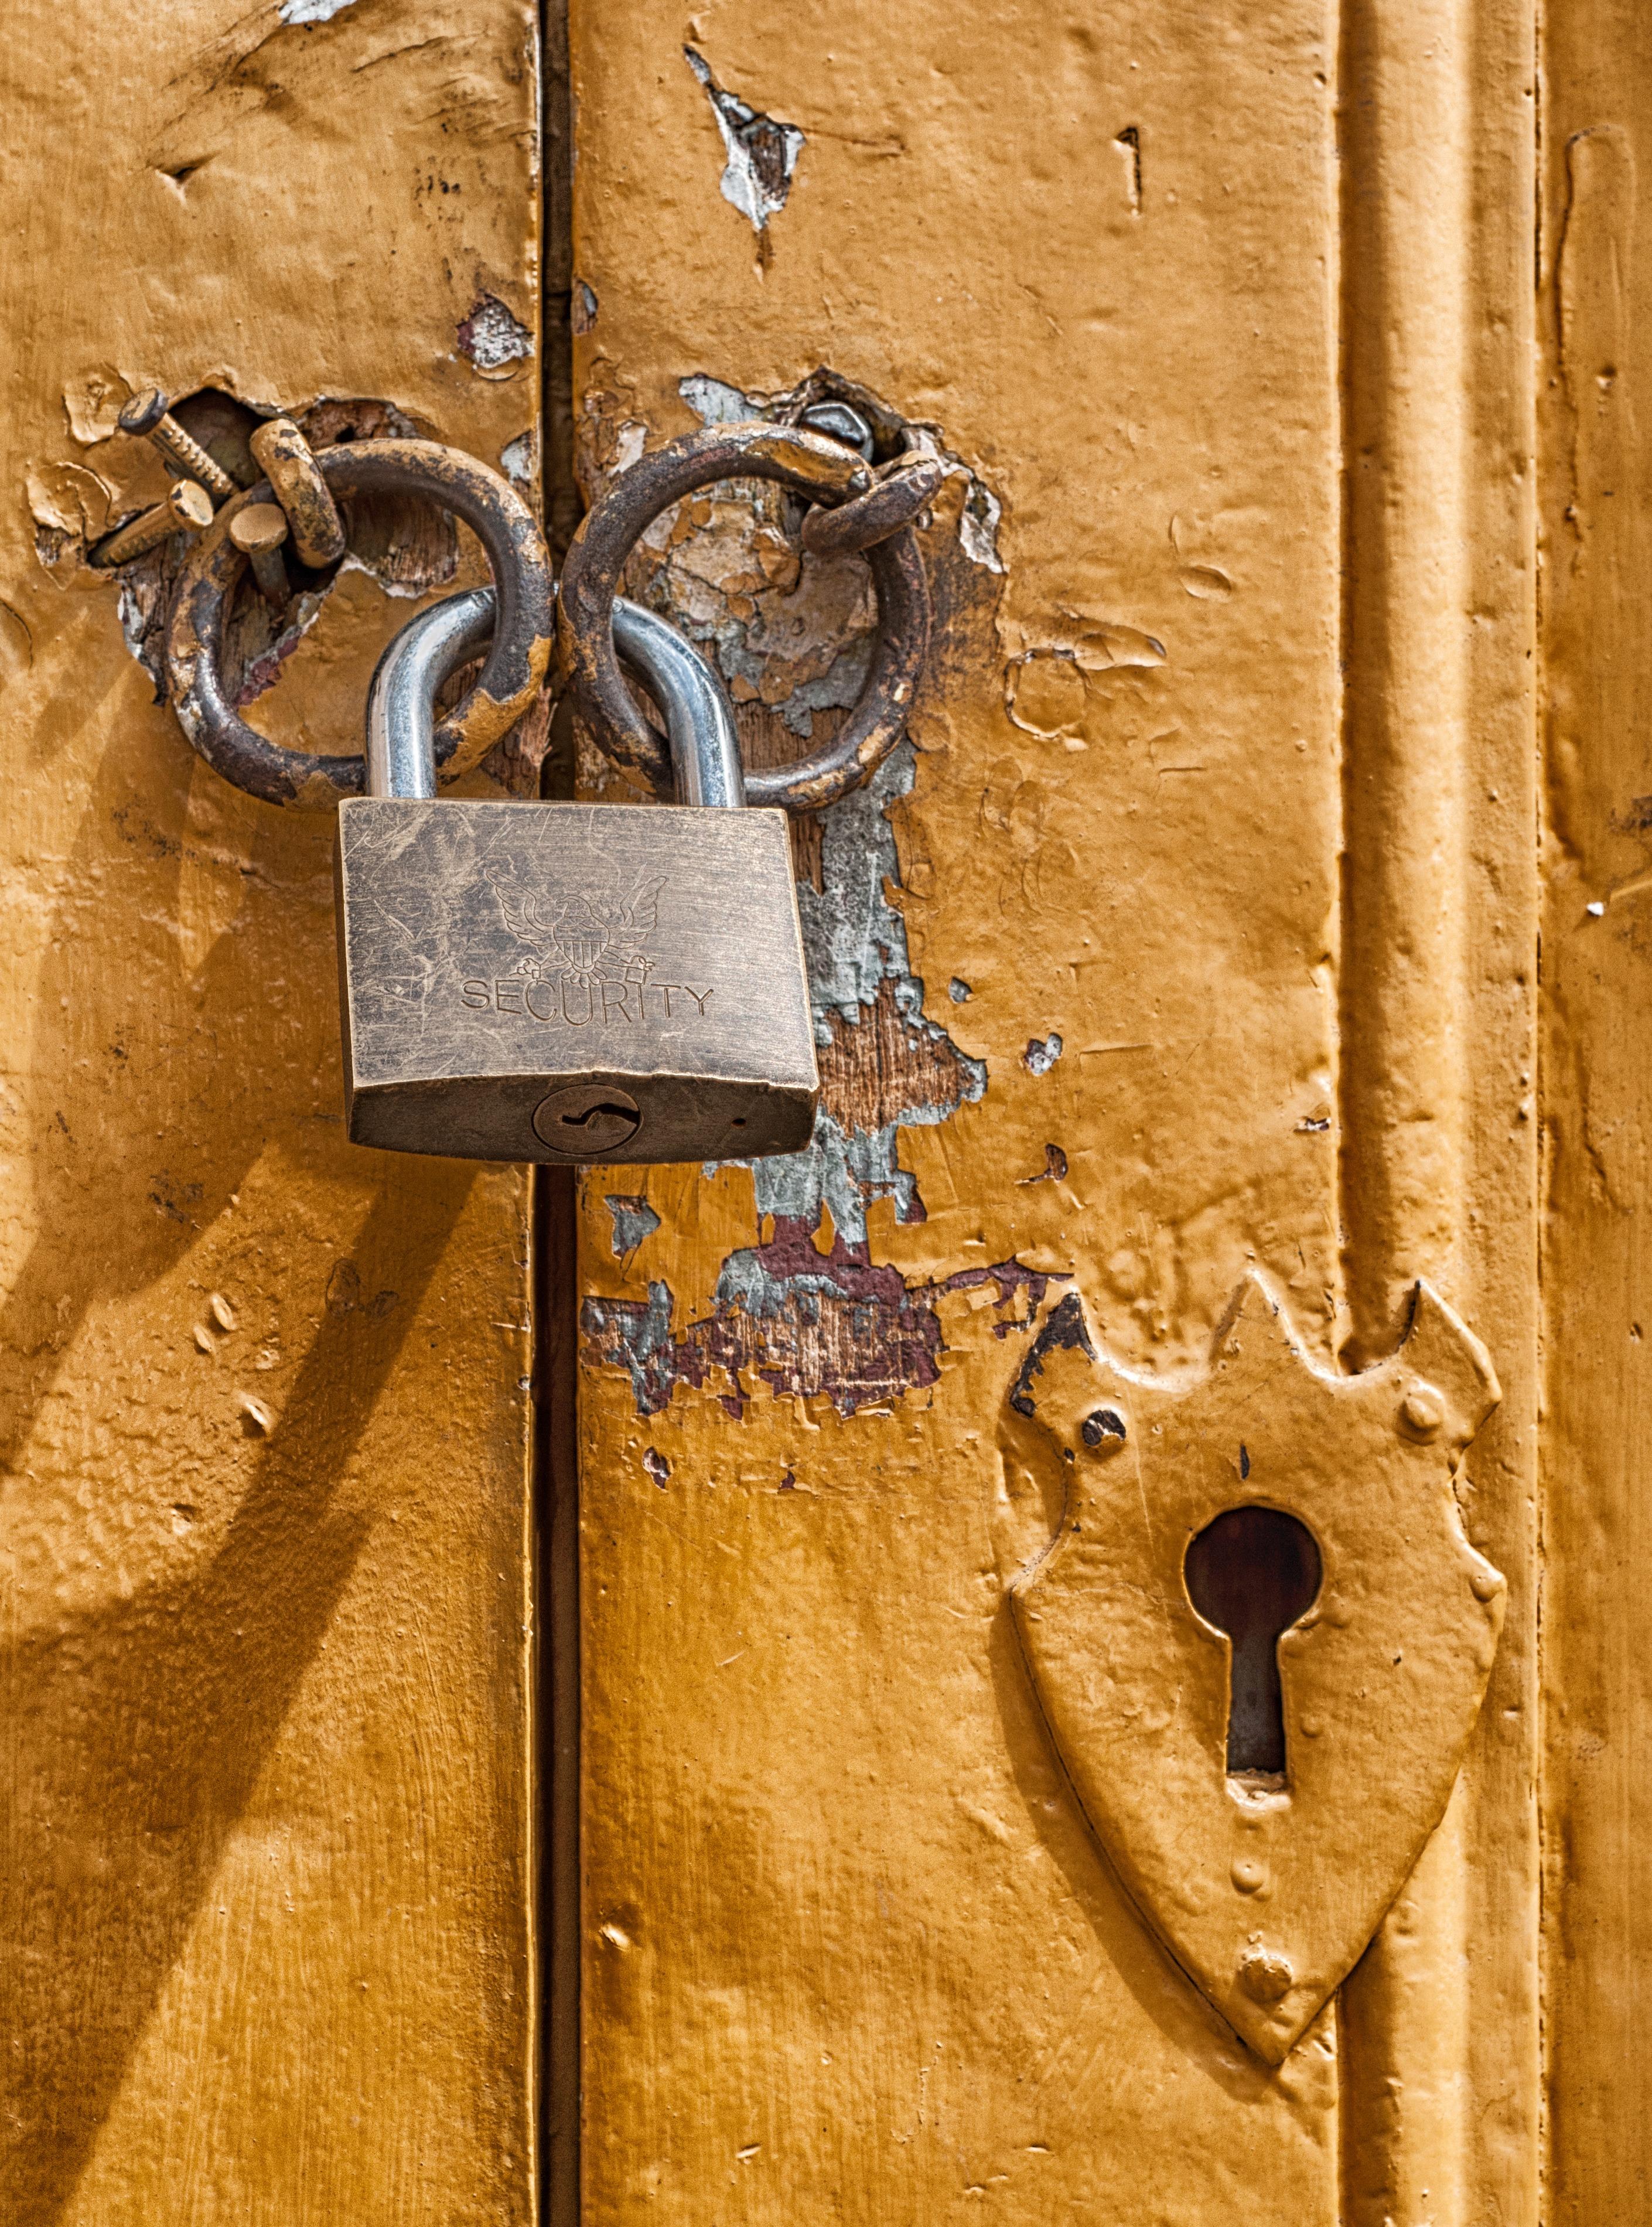 wood number macro door padlock close up hdr art lock carving key hole ancient history & Free Images : wood number macro door padlock close up hdr art ...